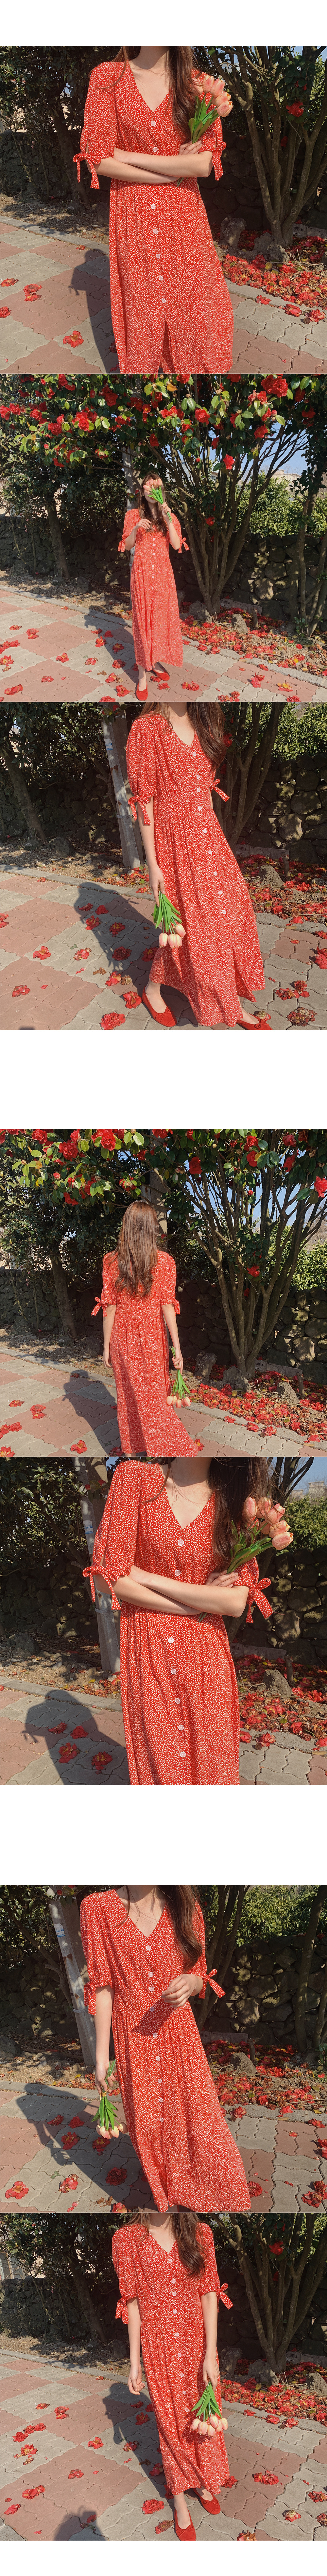 Mignon flower dress